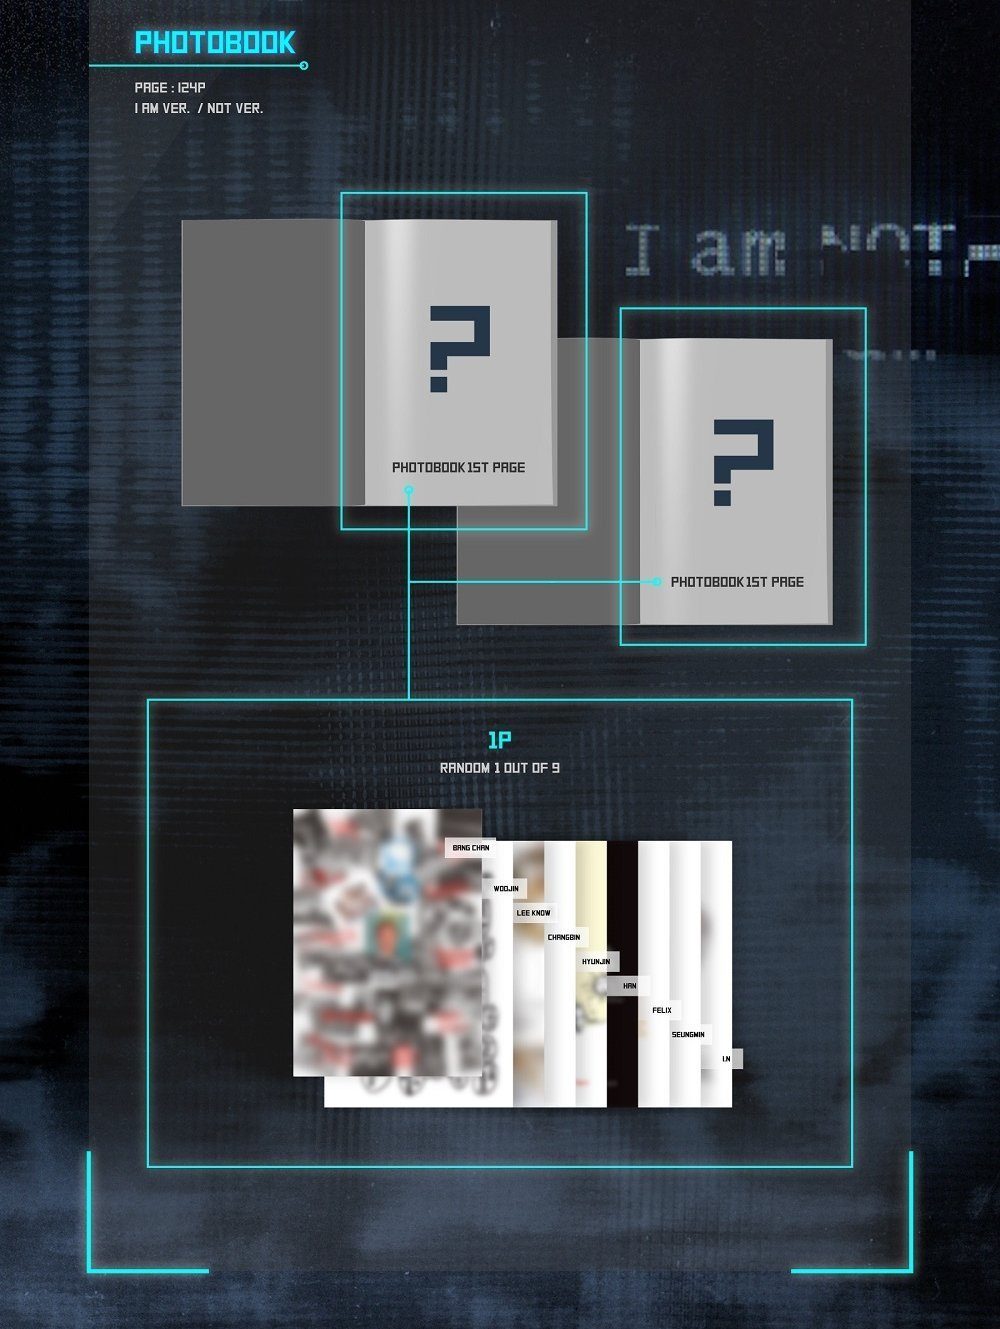 JYP Entertainment Stray Kids - I am NOT [I AM + NOT ver. Set] (1st Mini Album) 2CD+Photobook+3Photocards by JYP Entertainment (Image #3)